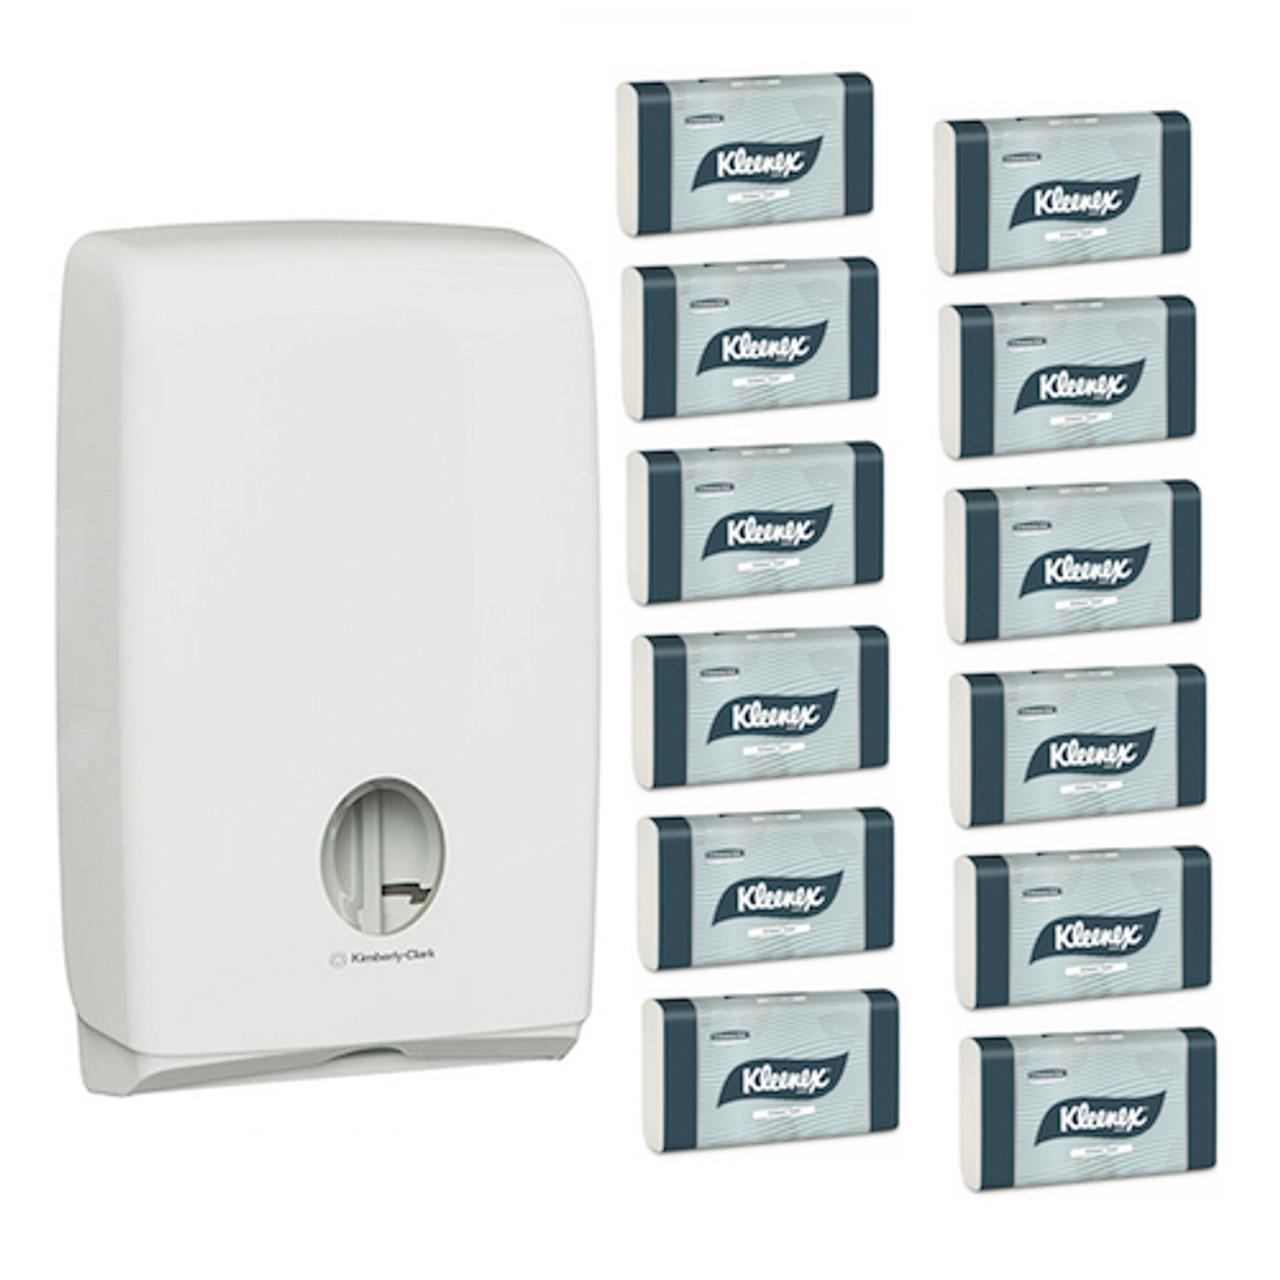 Kimberly Clark Kleenex Compact Hand Towel Starter Pack (4440 70240) Kimberly Clark Professional